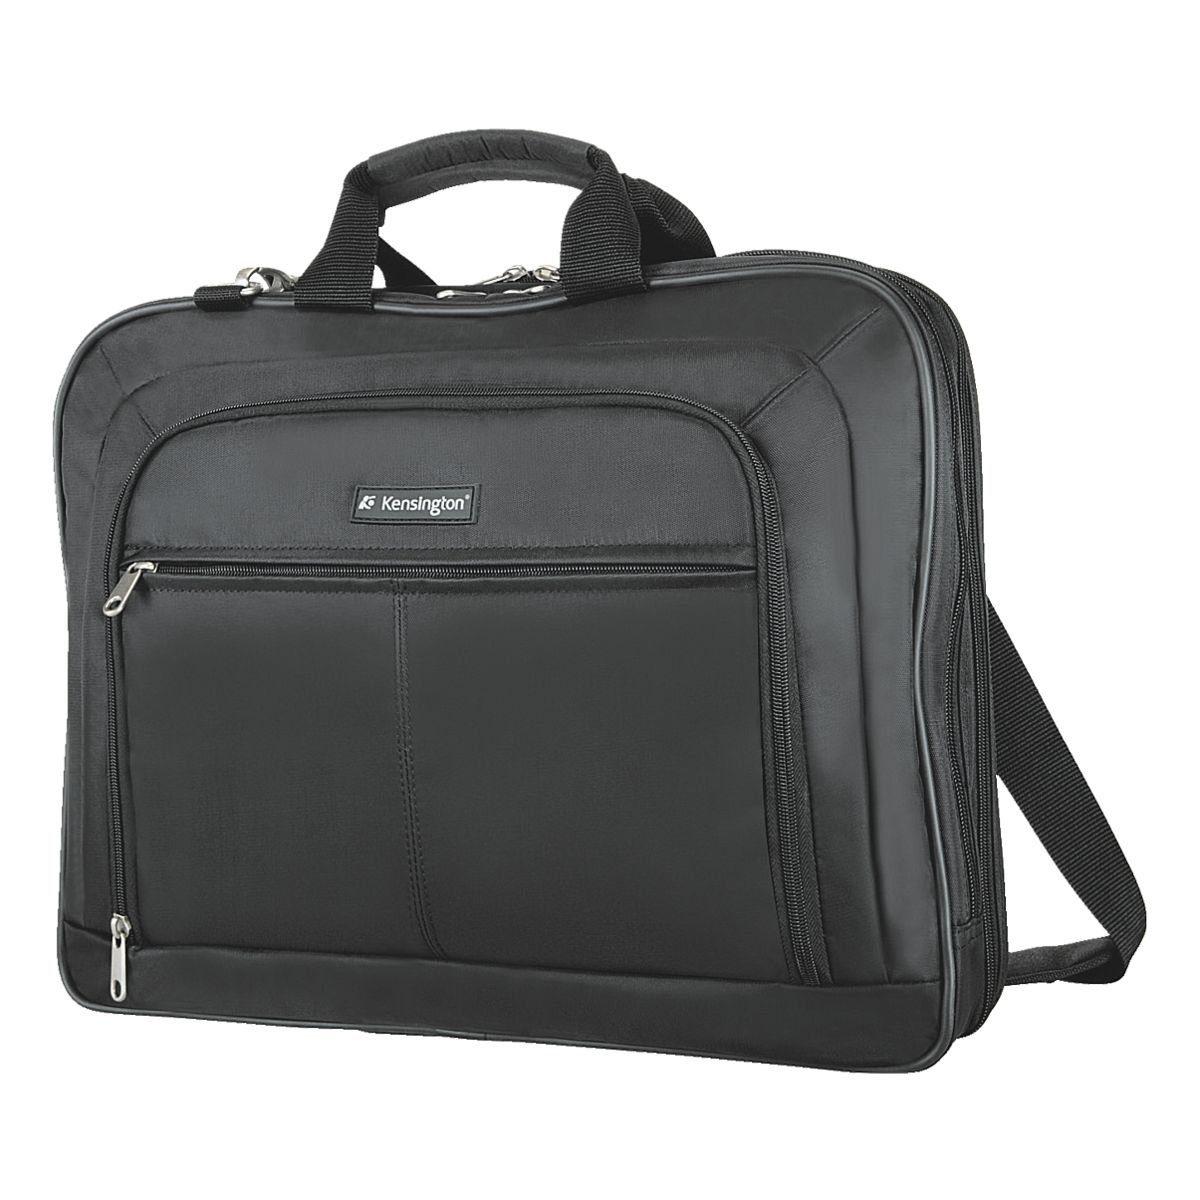 KENSINGTON Laptoptasche »SP45«